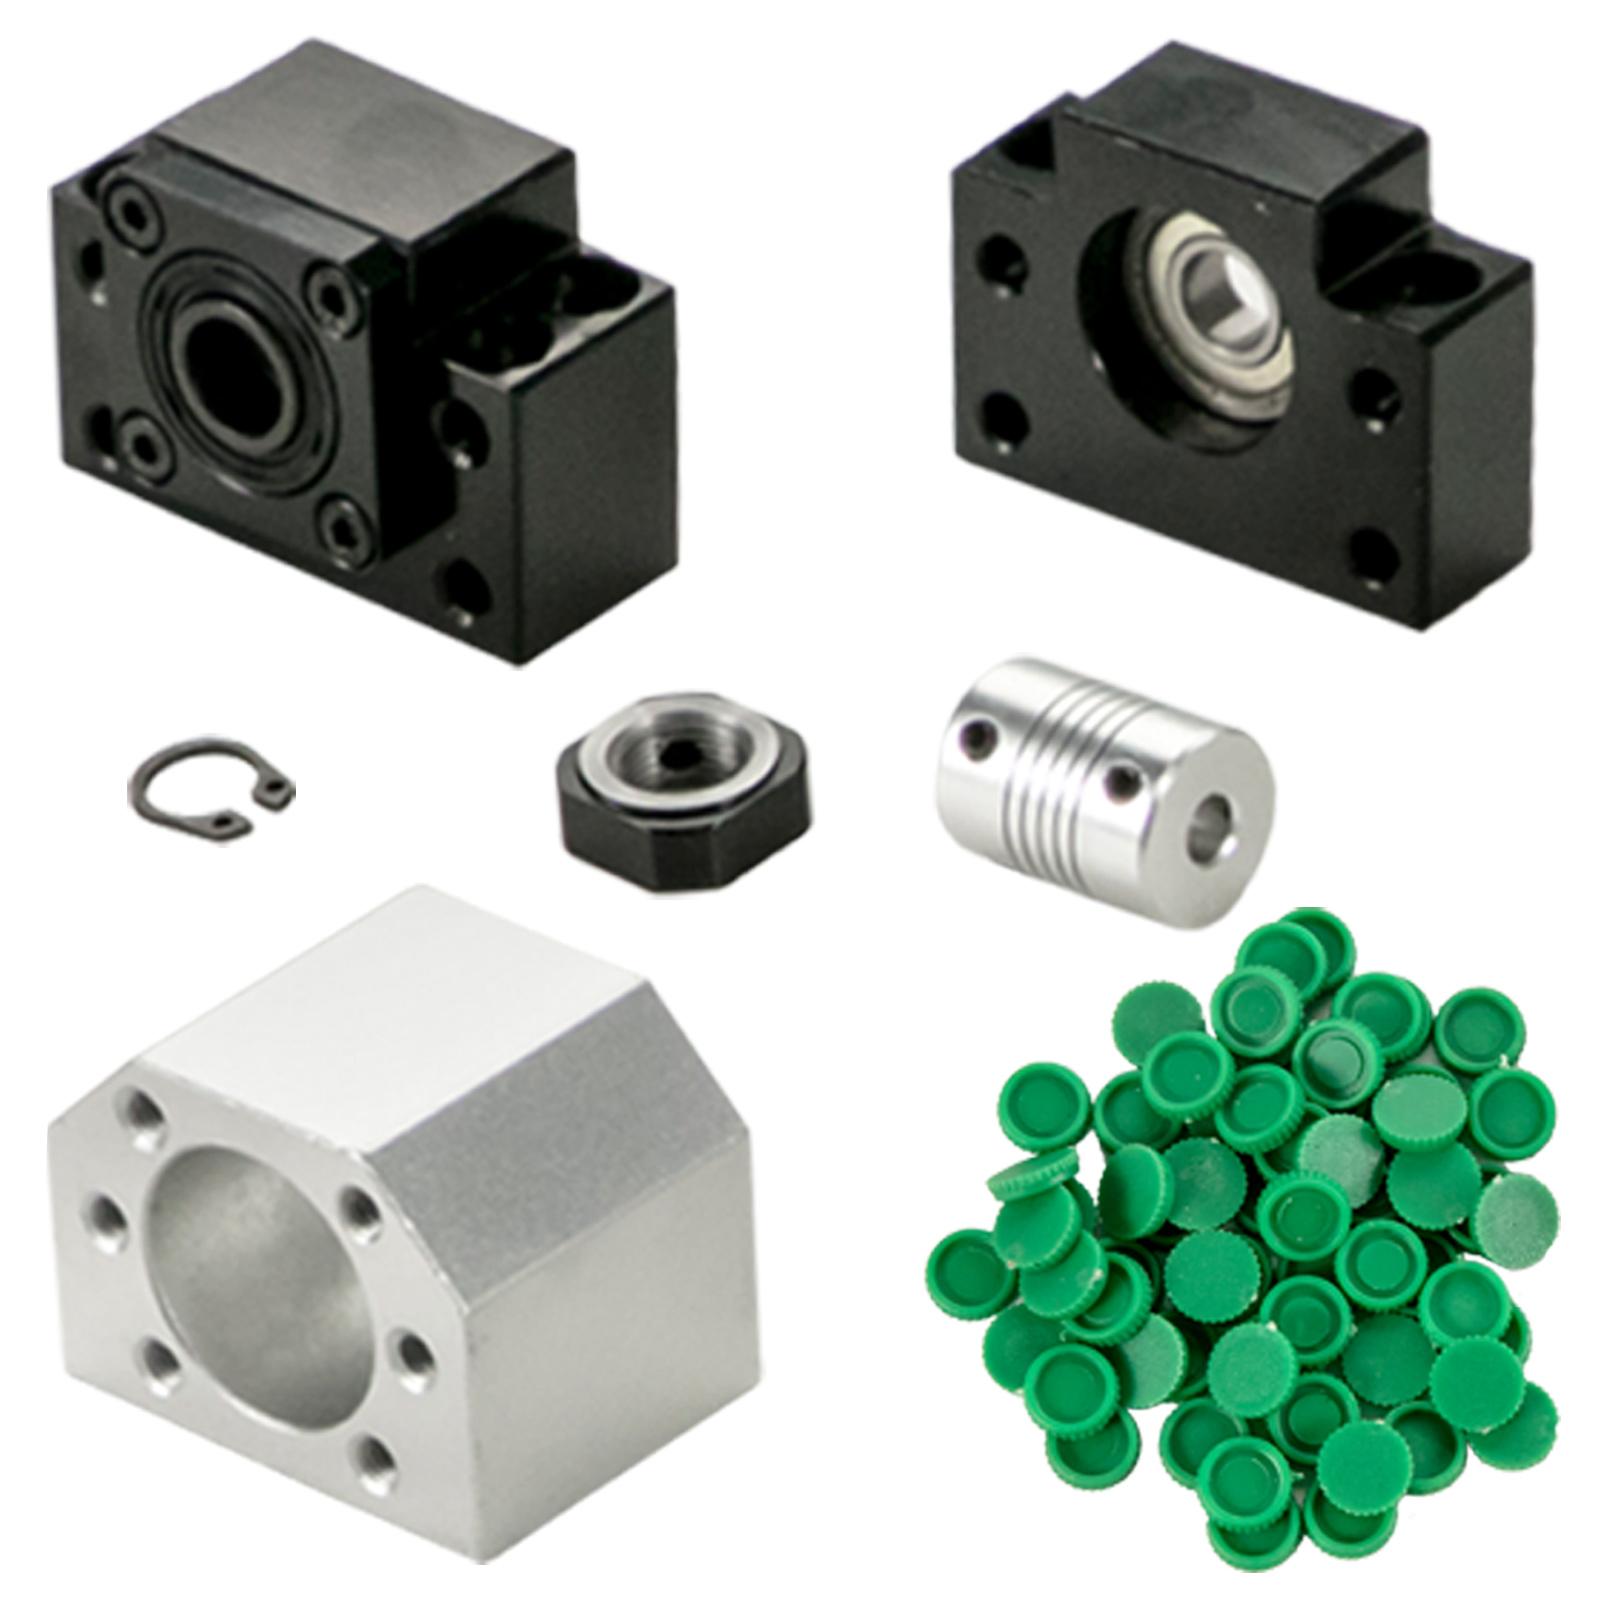 Guida-Lineare-CNC-HGR20-200mm-2-Pezzi-Blocco-di-Cuscinetti-4-Pezzi miniatura 9